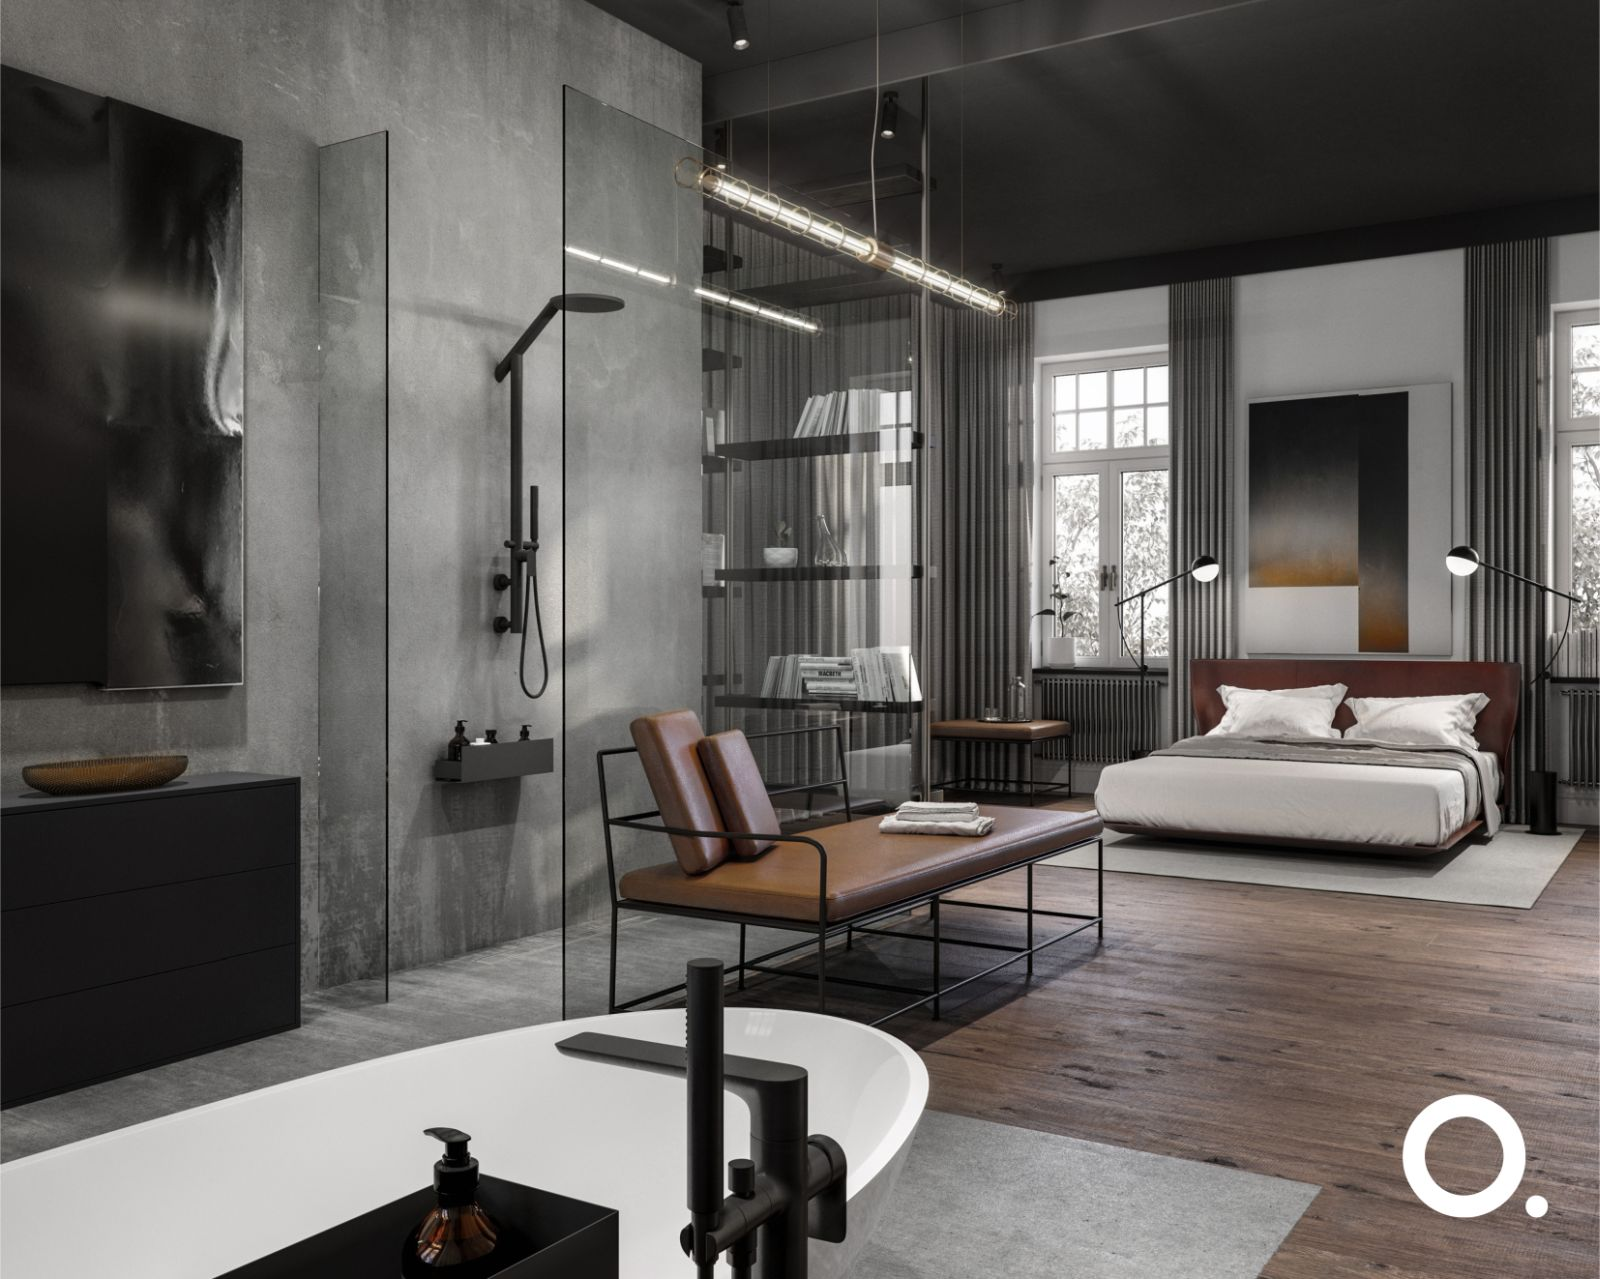 studio_o_wnetrze-vetiver_luksusowe-marki3